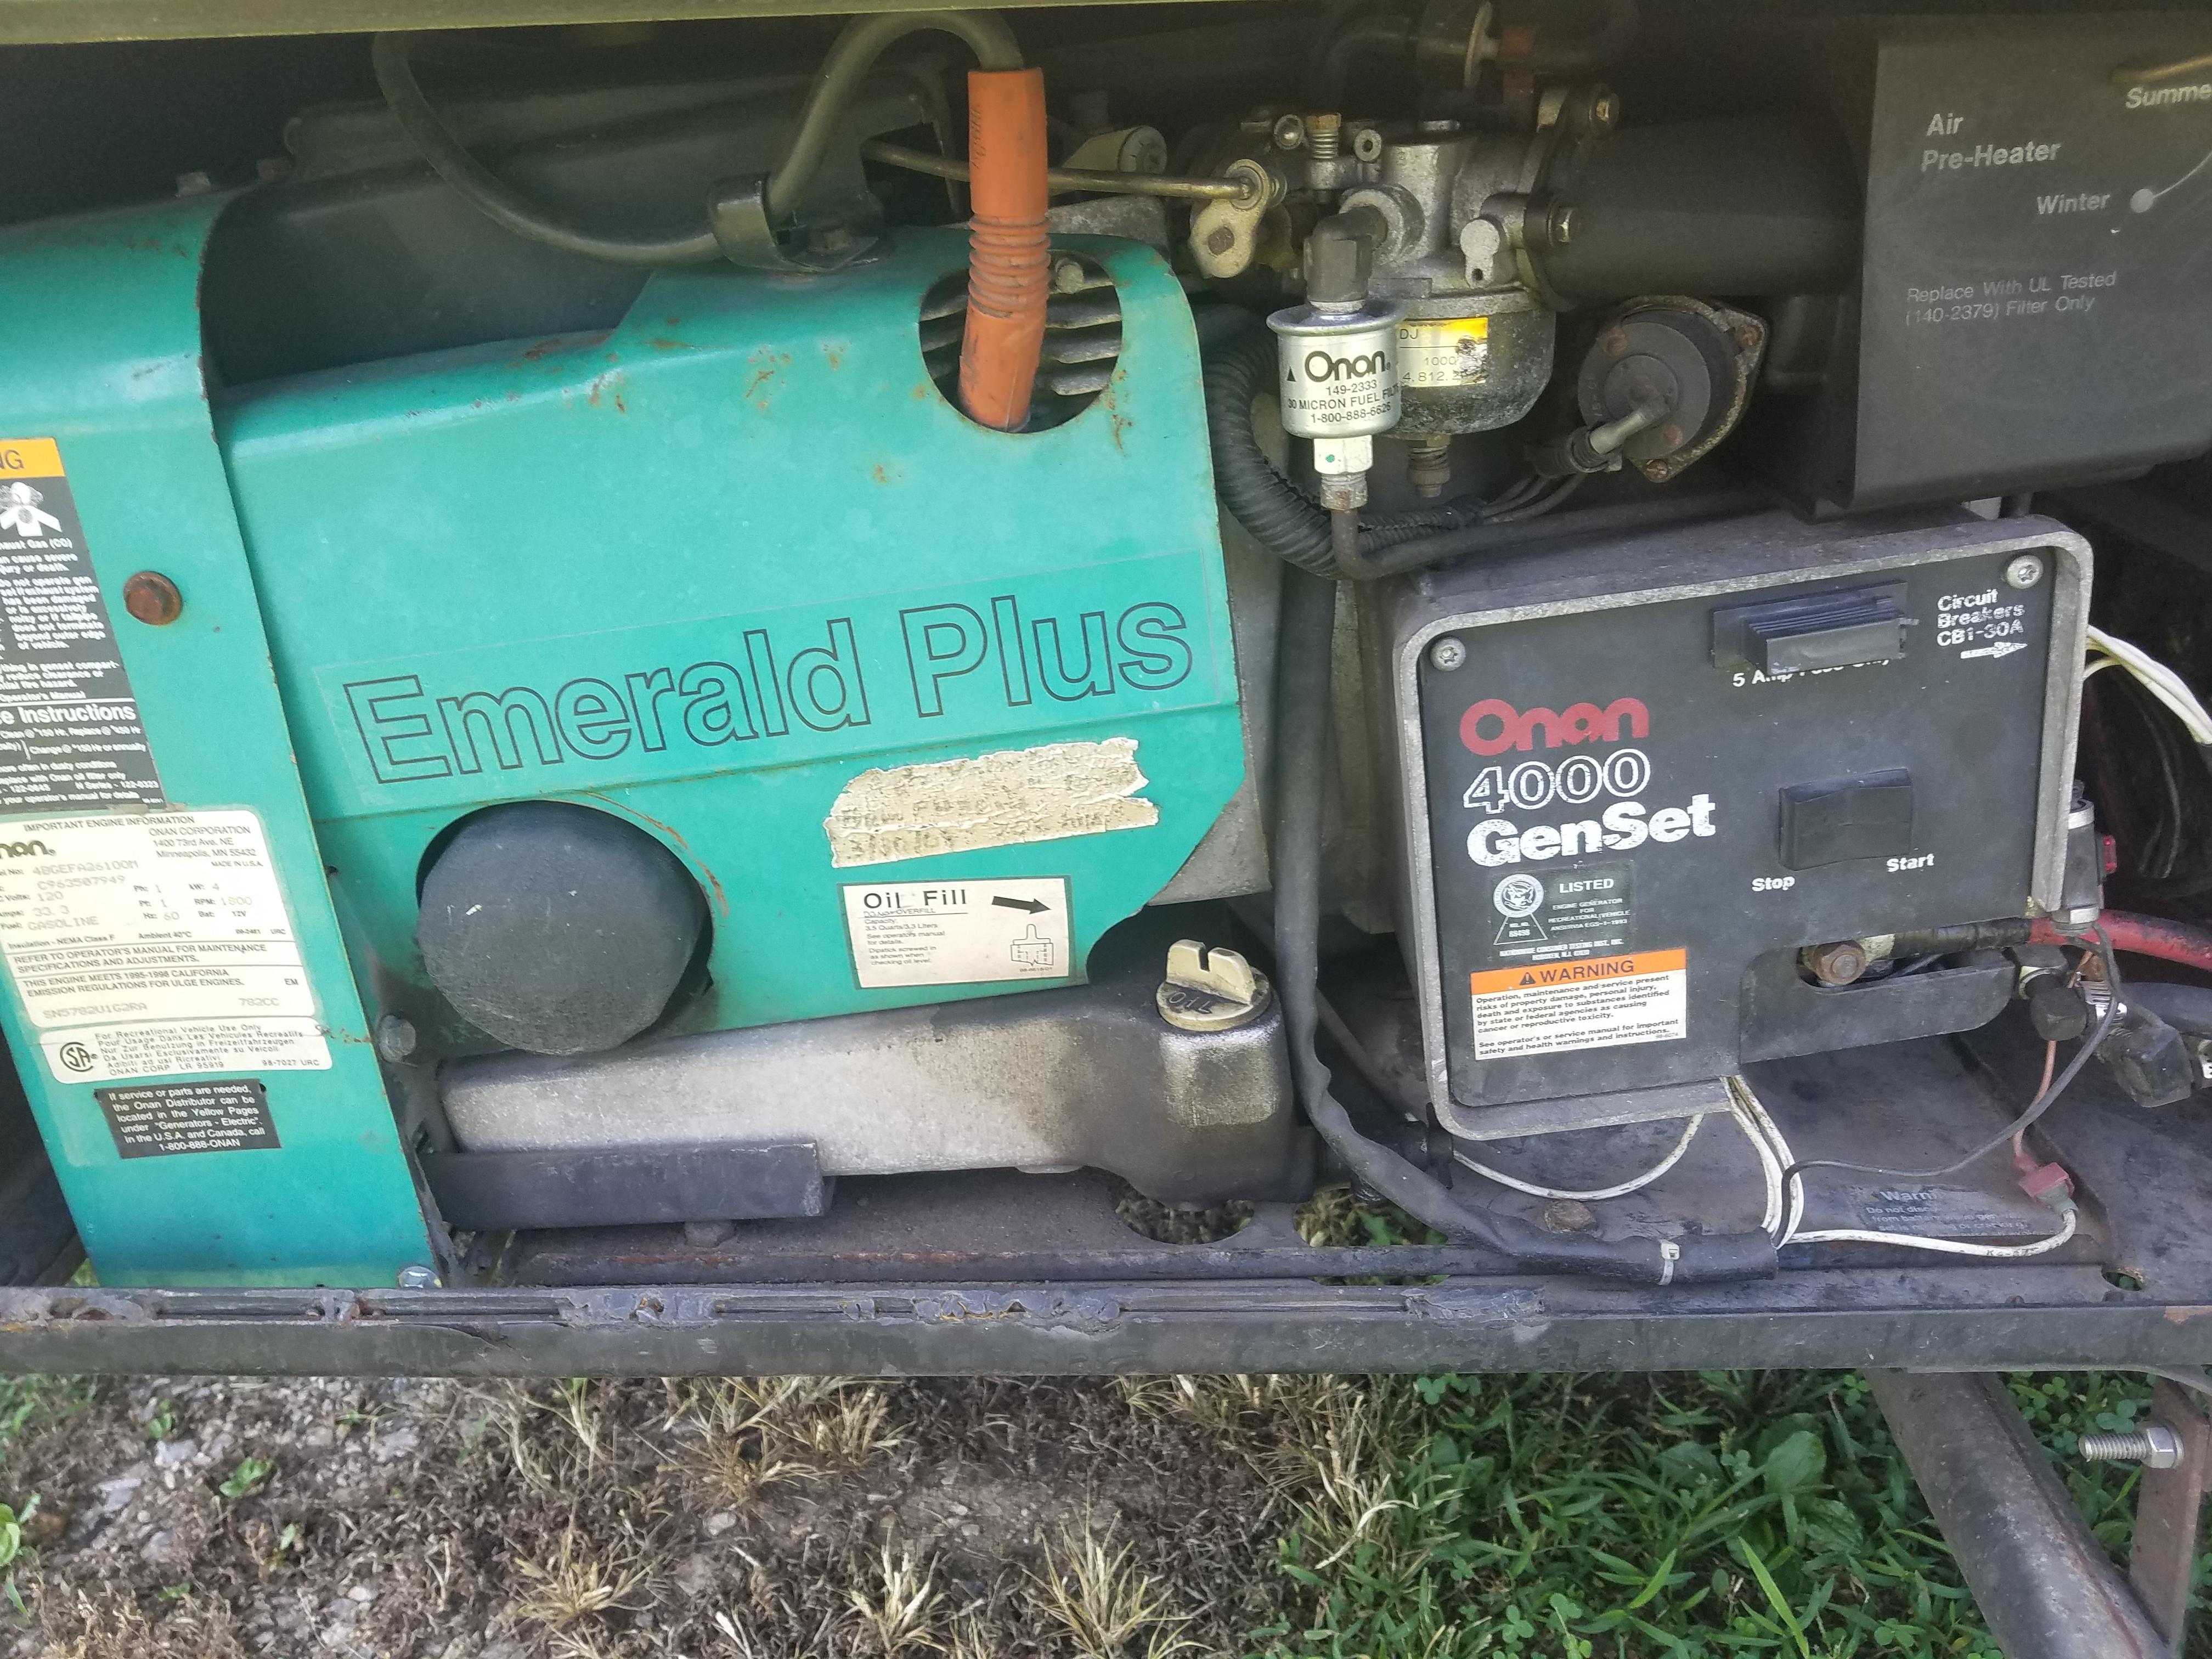 I have an onan 4000 gin set generator in my older model motor home ...